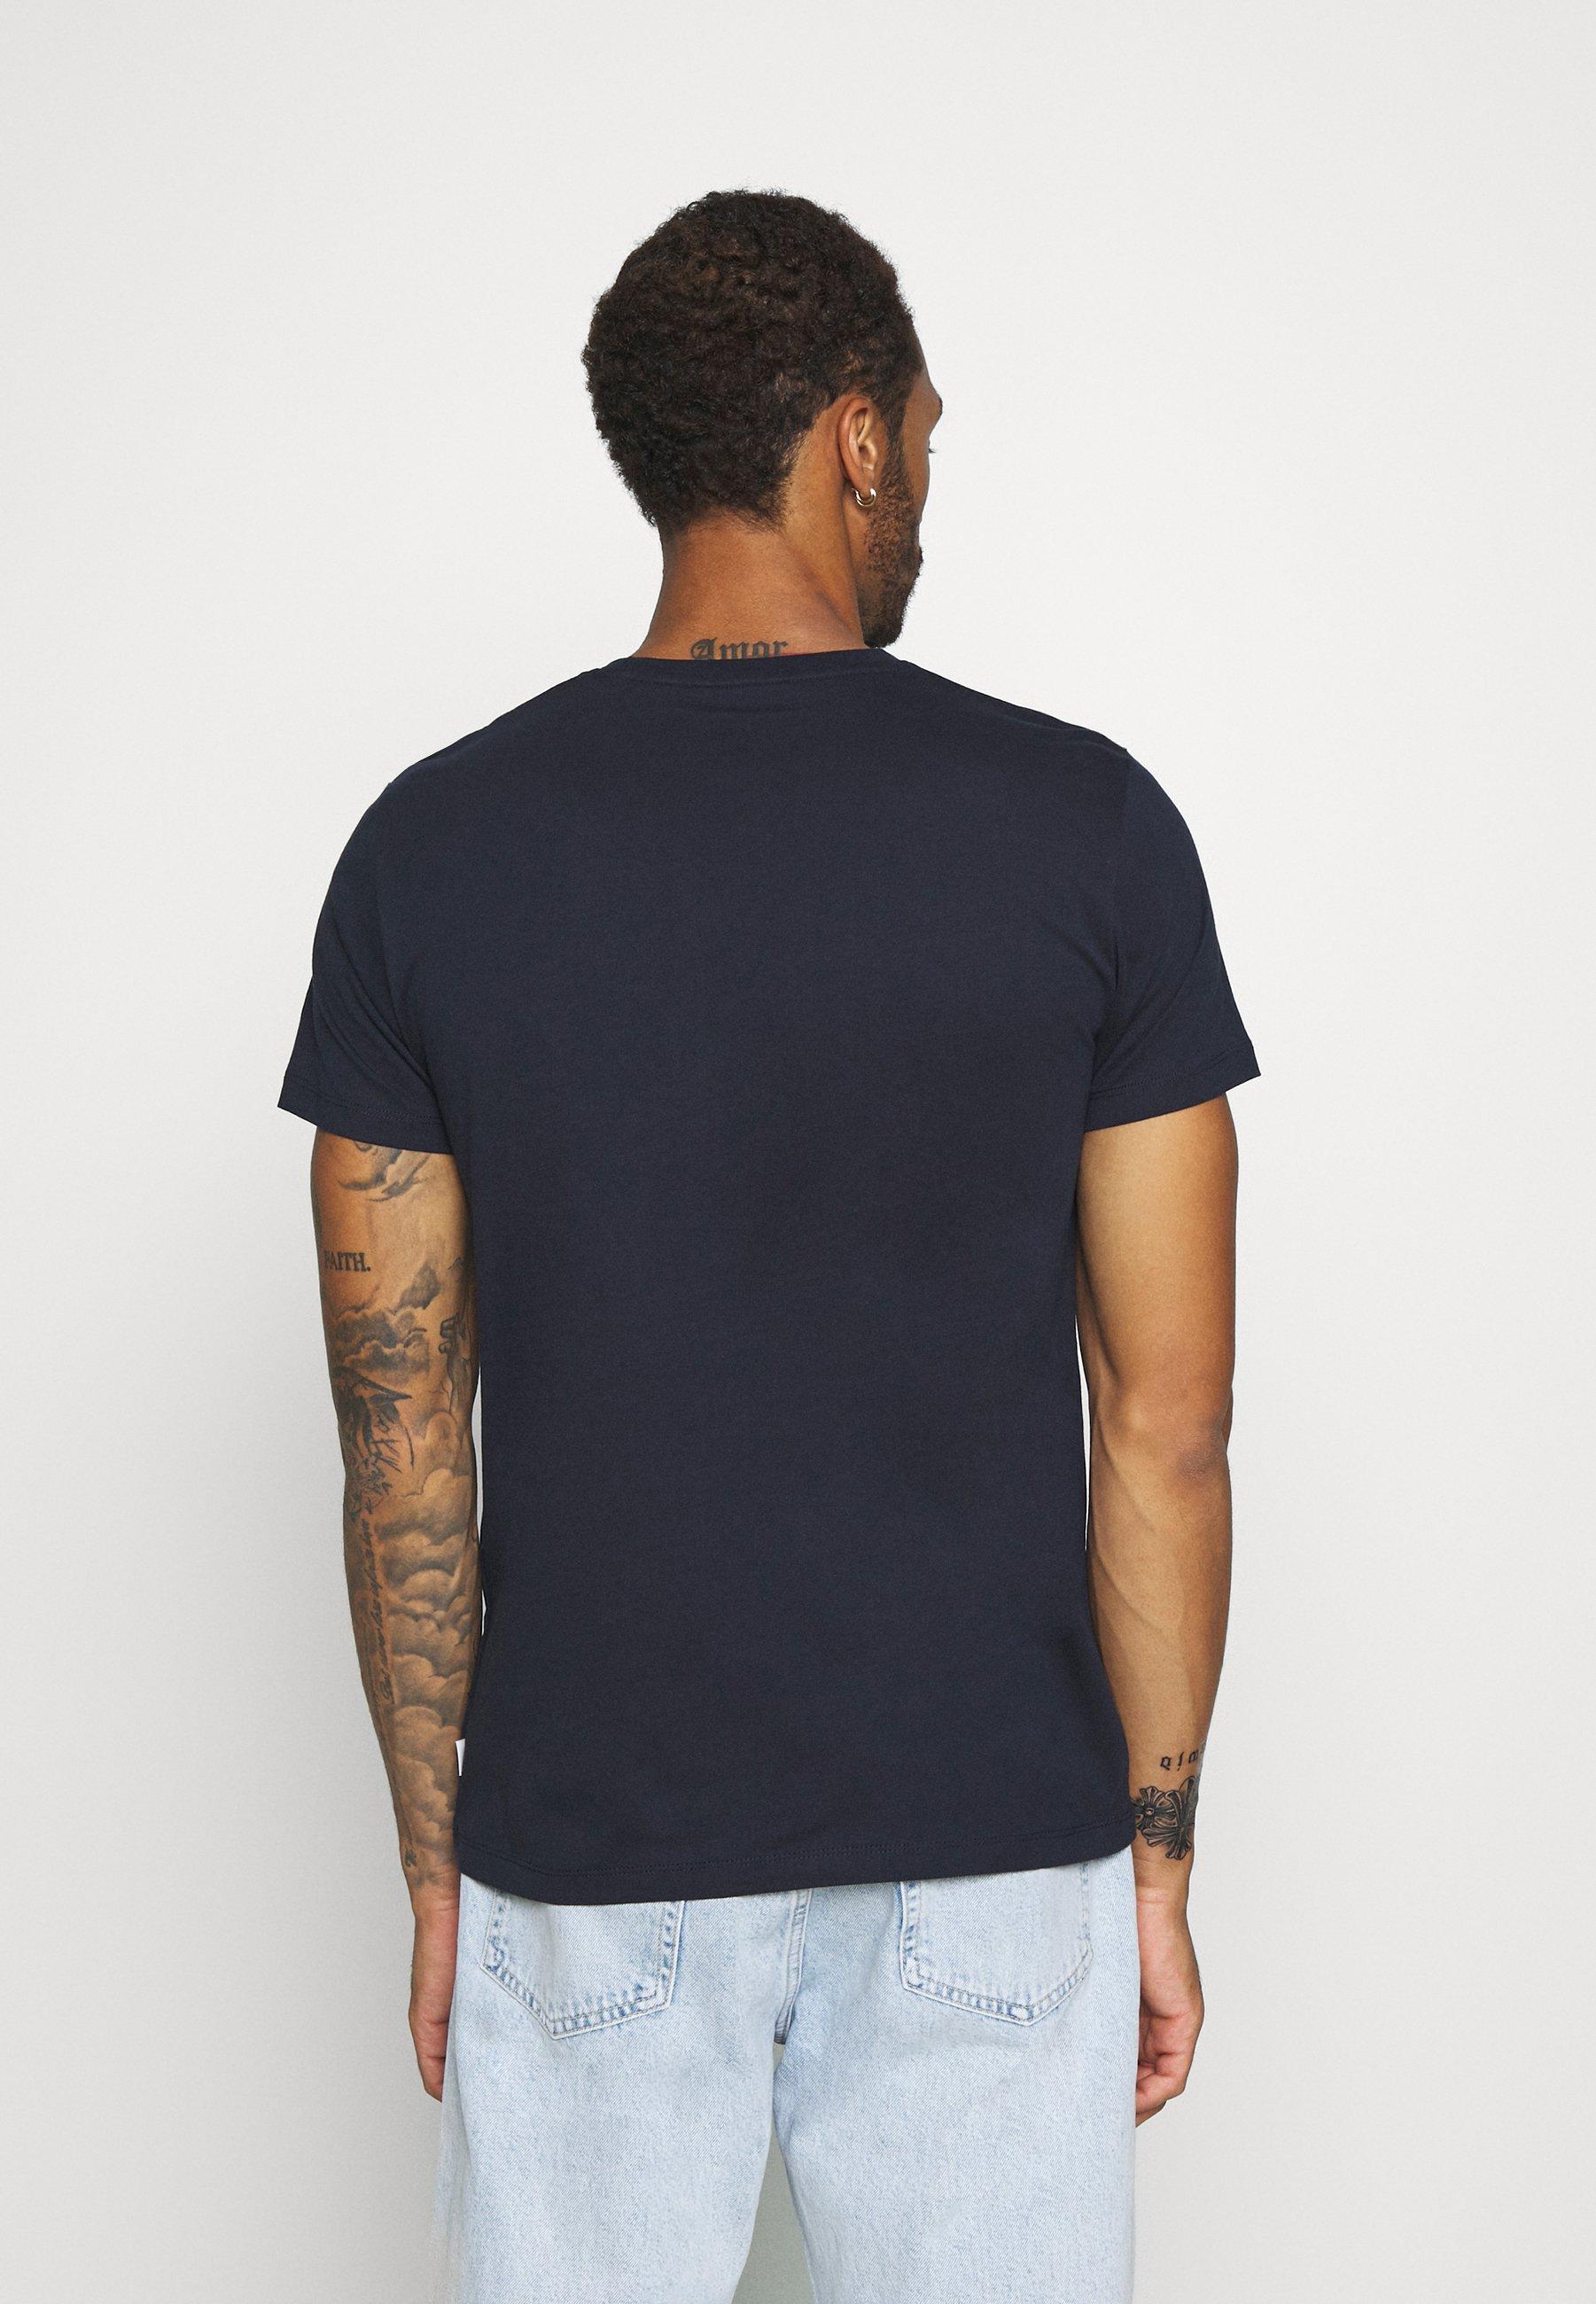 Esprit T-shirt Print - Navy